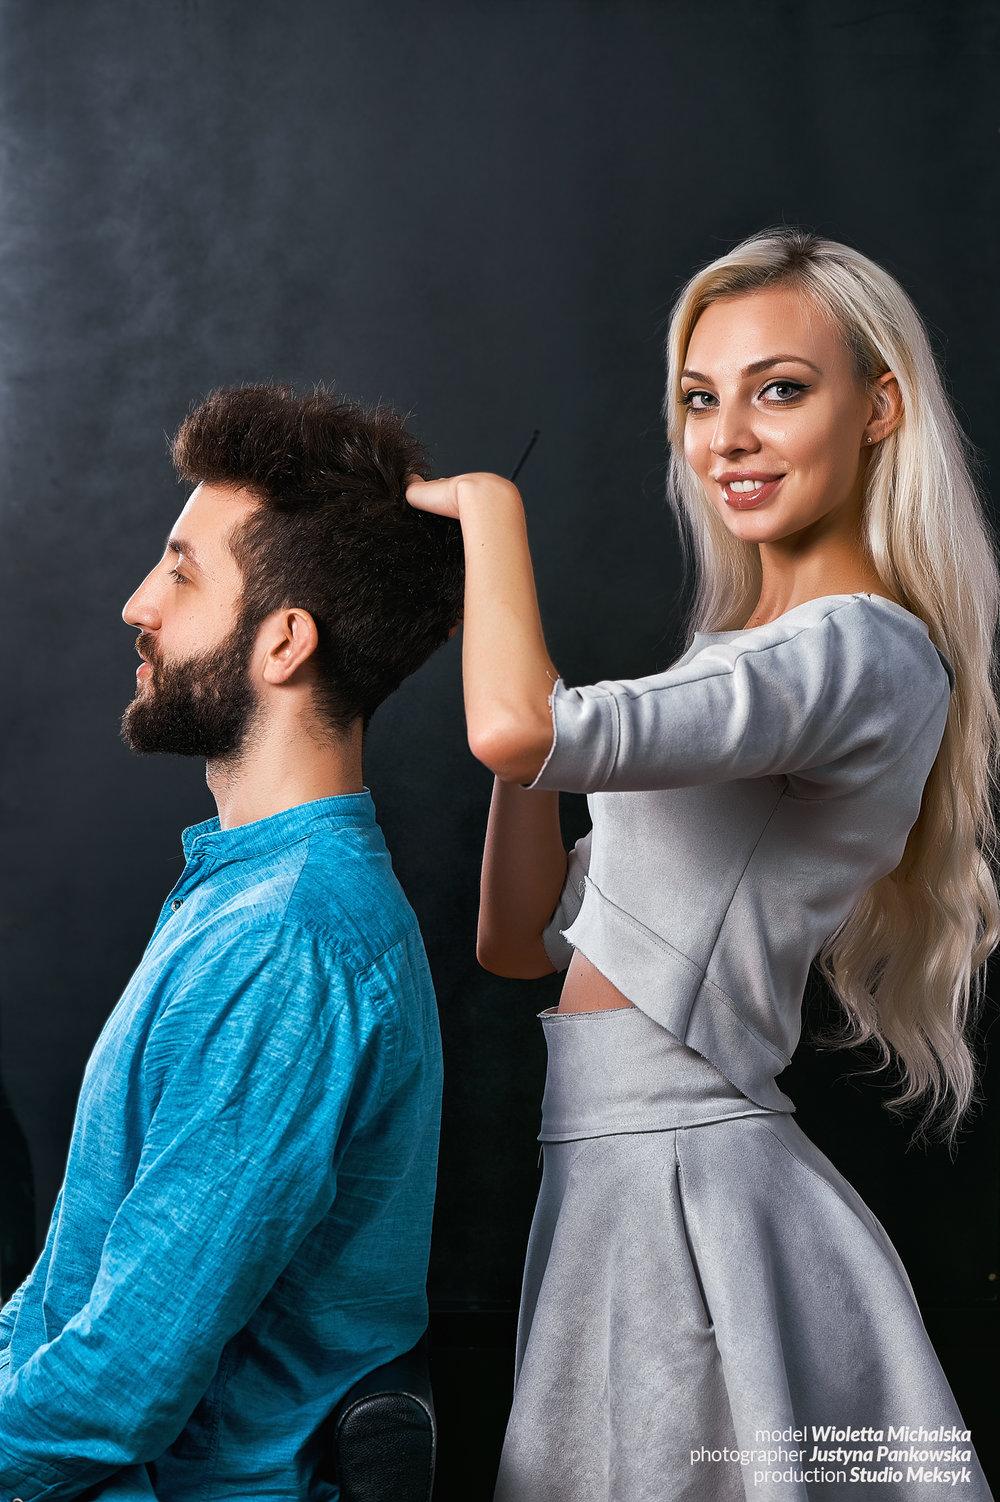 , Wioletta Michalska, portrait, blonde, hairstyle, makeup, natural,  beauty, girl, hot, sexy, sensual, photo, peaple, phoptography, Justyna Pankowska, Studio Meksyk,,nożyczki, z klientem.jpg